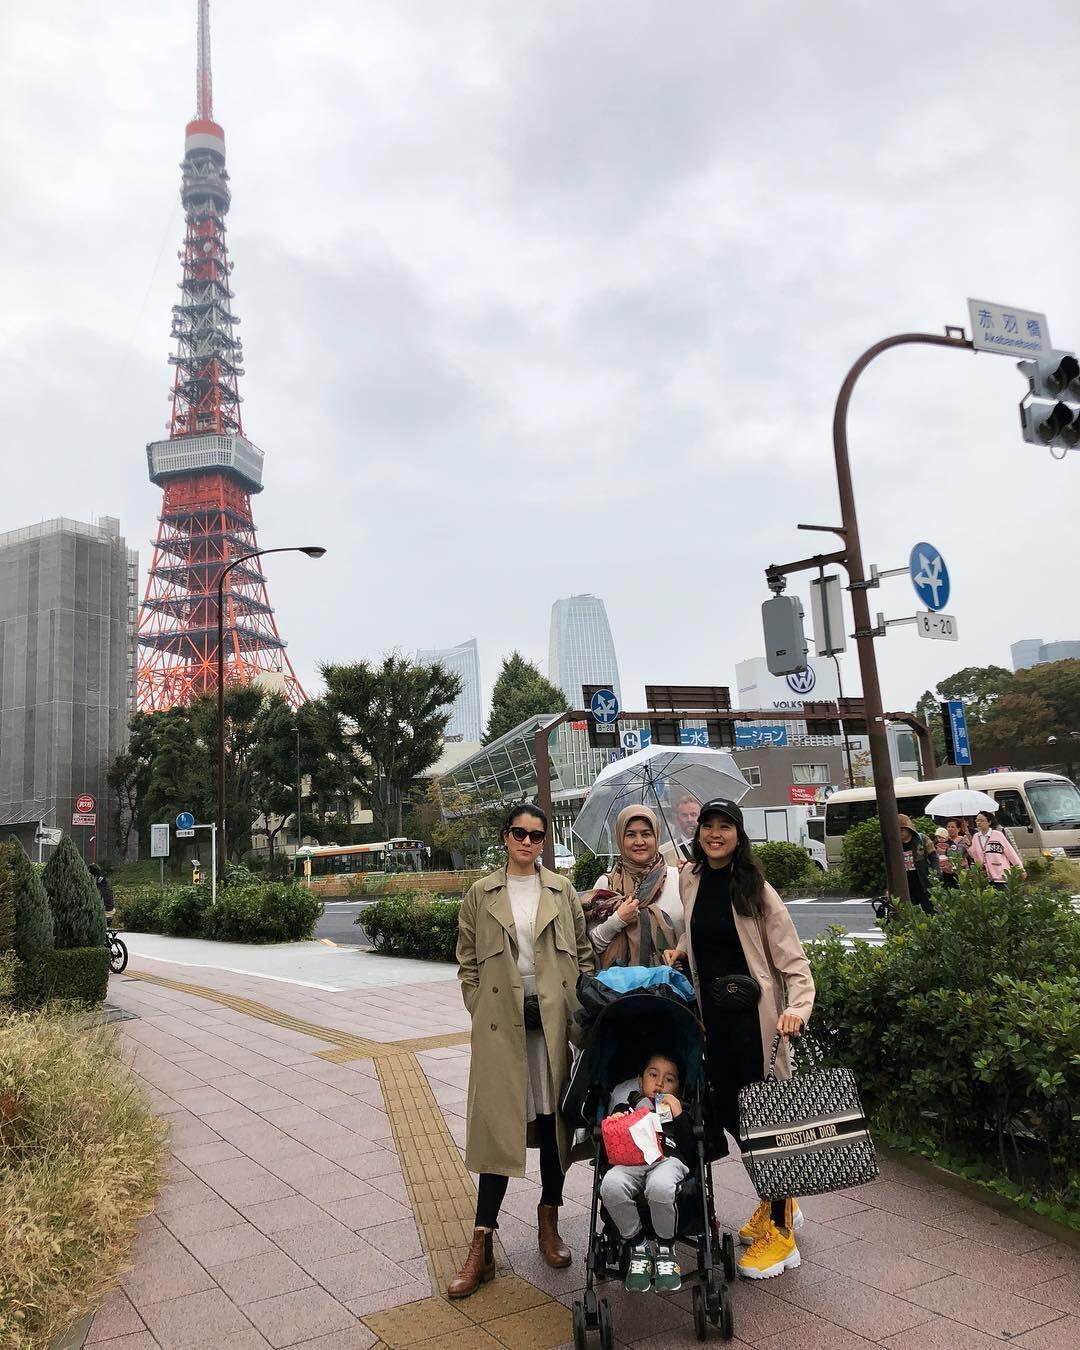 Bareng Anak, Ini 10 Potret Bahagia Marcella Zalianty di Jepang